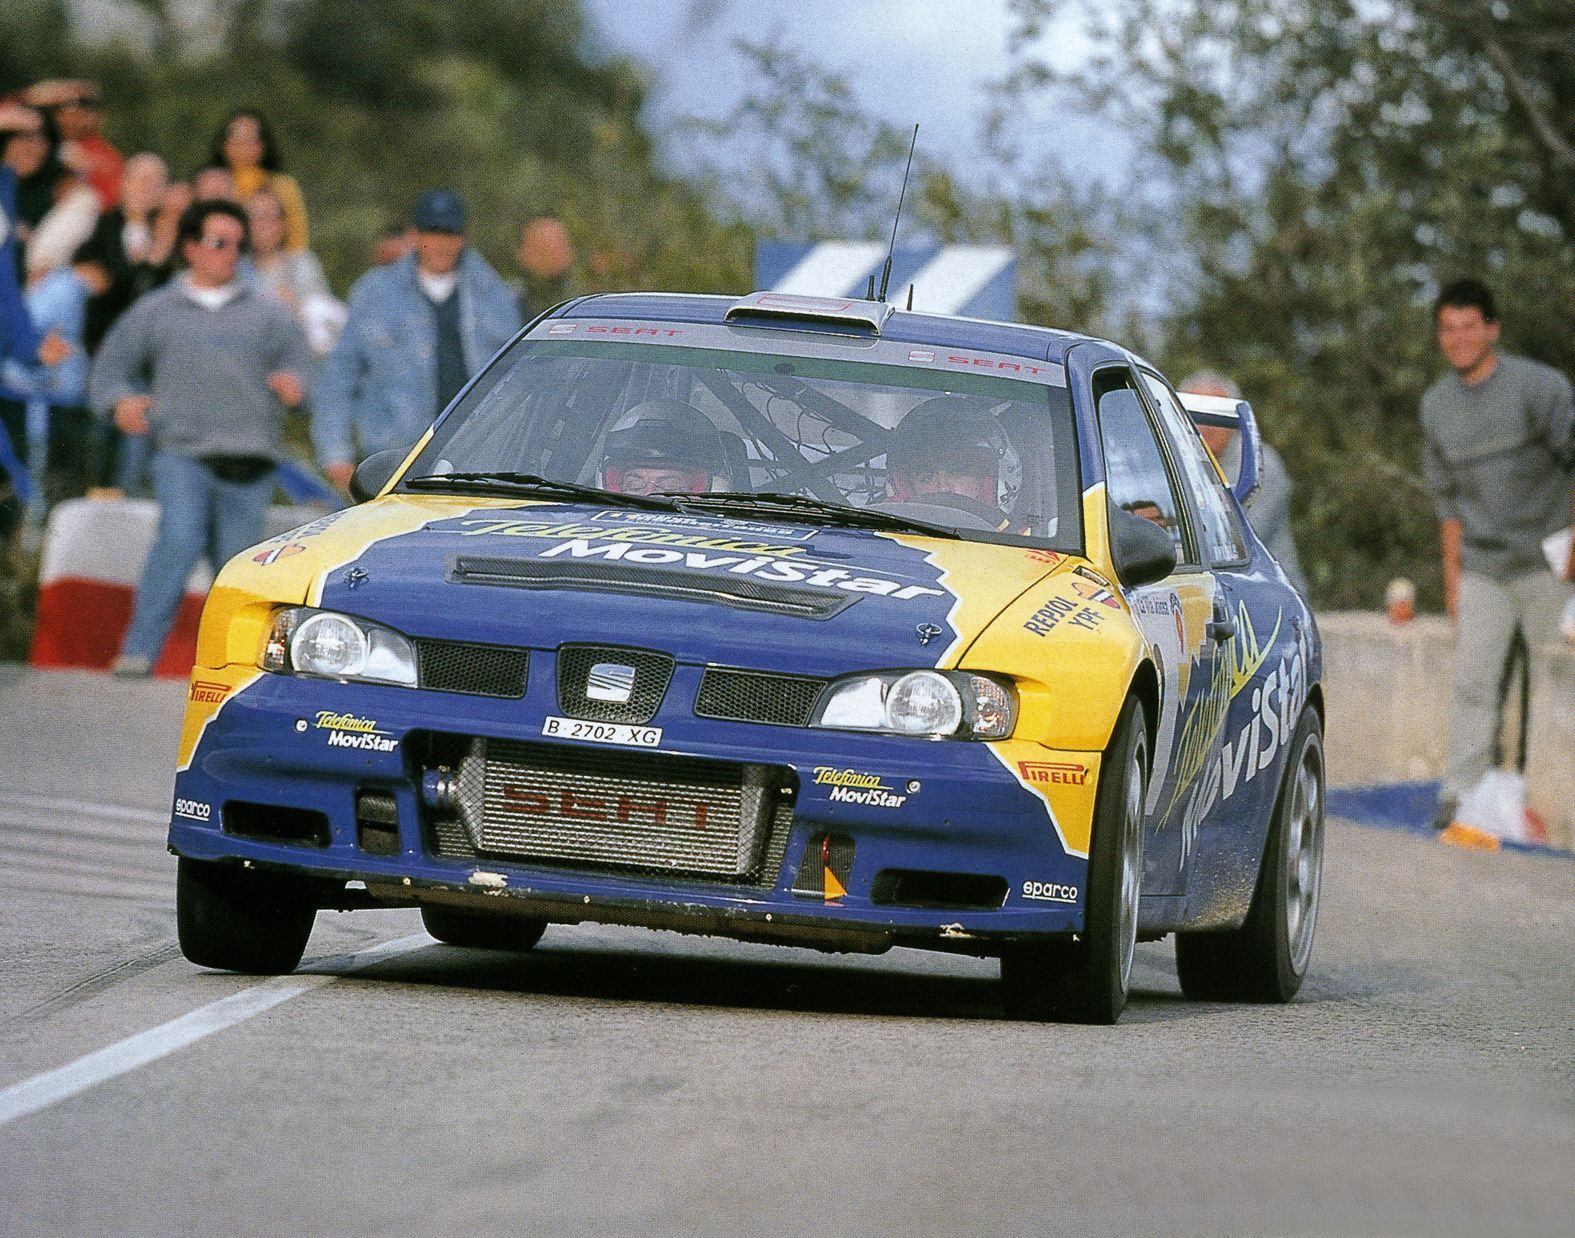 2001 s ca ellas seat c rdoba wrc evo 3 xi rallye mediterraneo